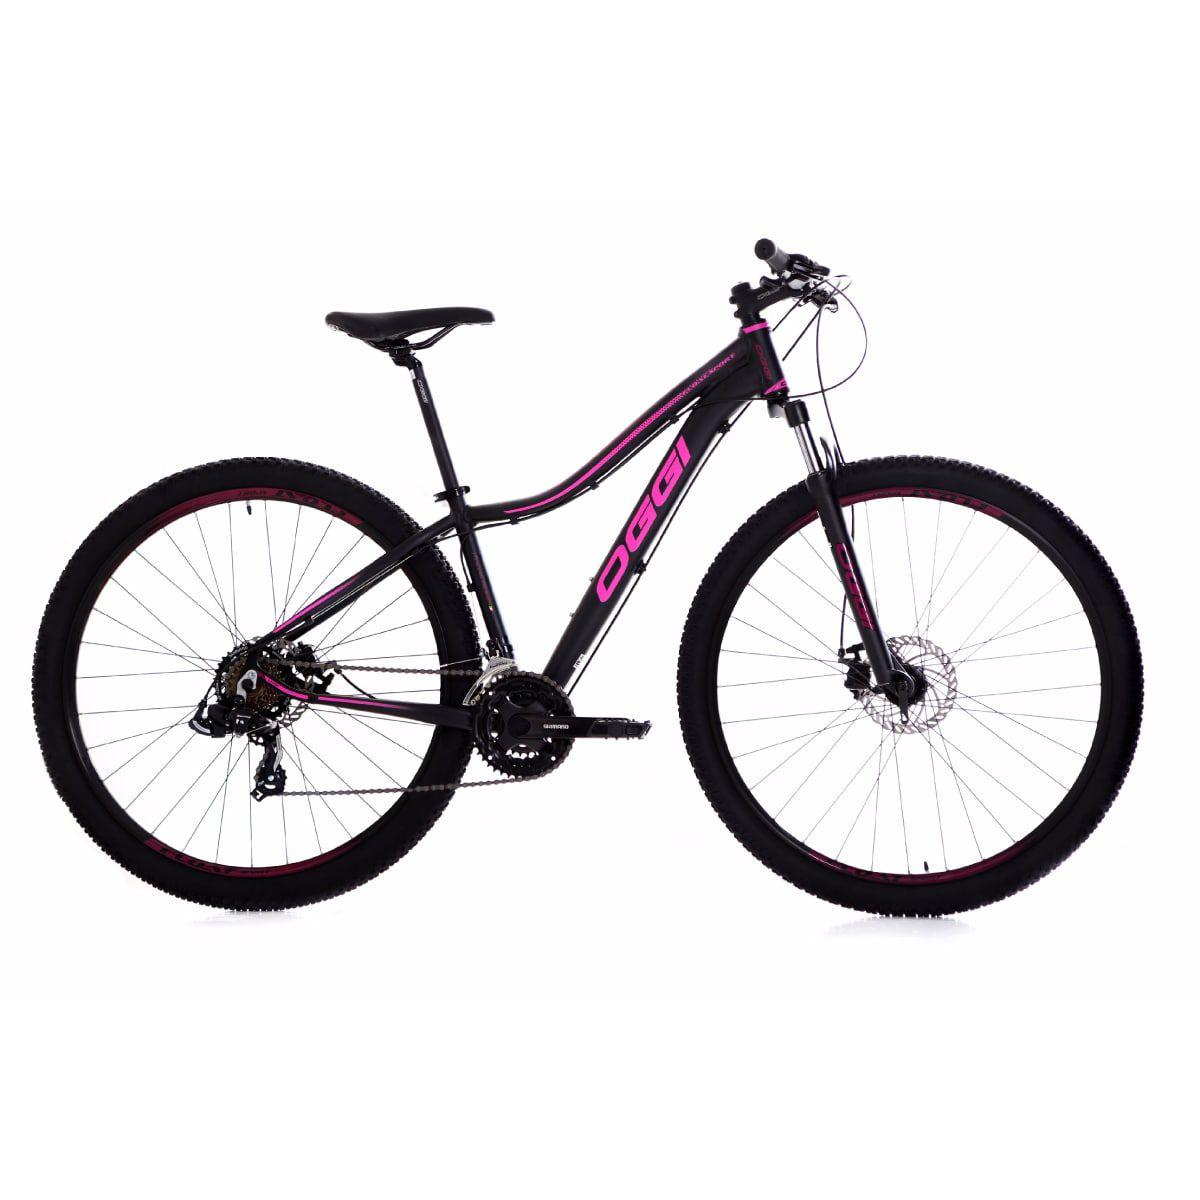 Bike Oggi Float Sport 2020 21v Freio a Disco Shimano